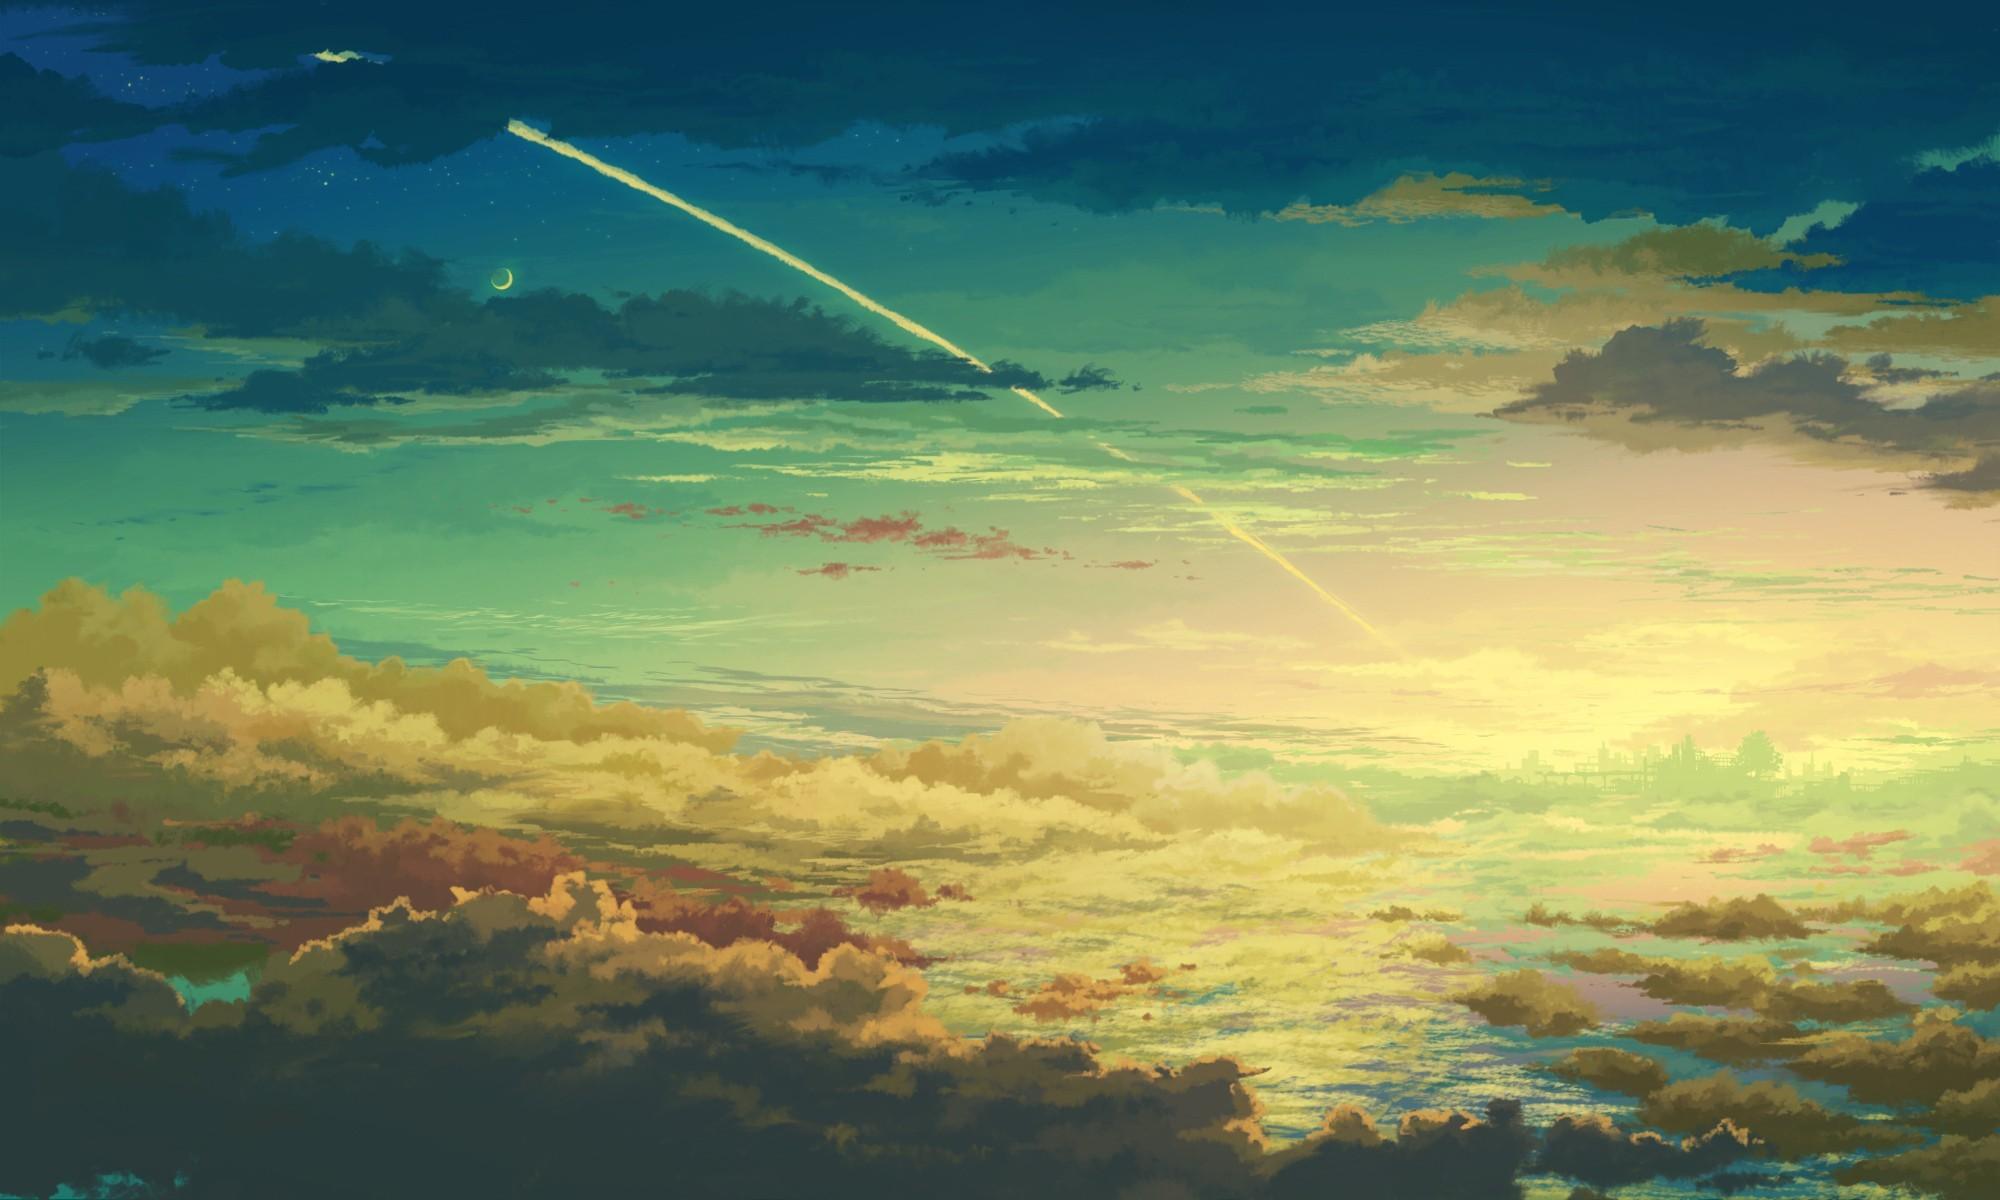 Wallpaper : sunlight, anime, space, sky, artwork, clouds